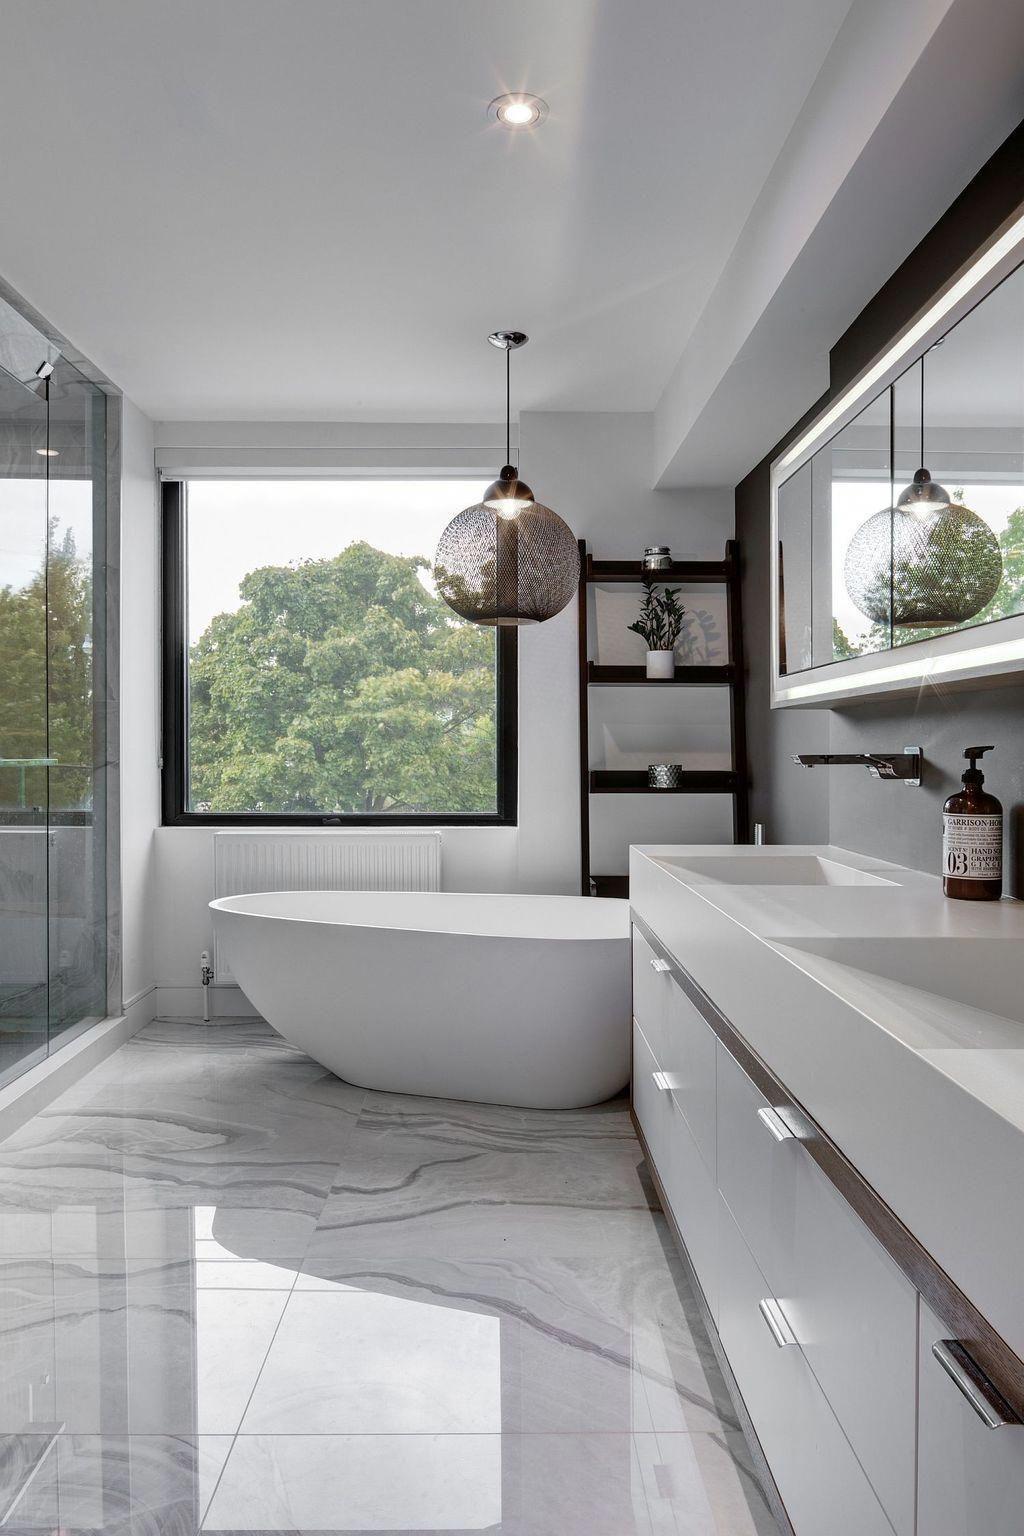 Home Decorating Games For Adults Homedecorationbusiness Code 2916608083 Creative Bathroom Design Bathroom Design Decor Modern Home Interior Design